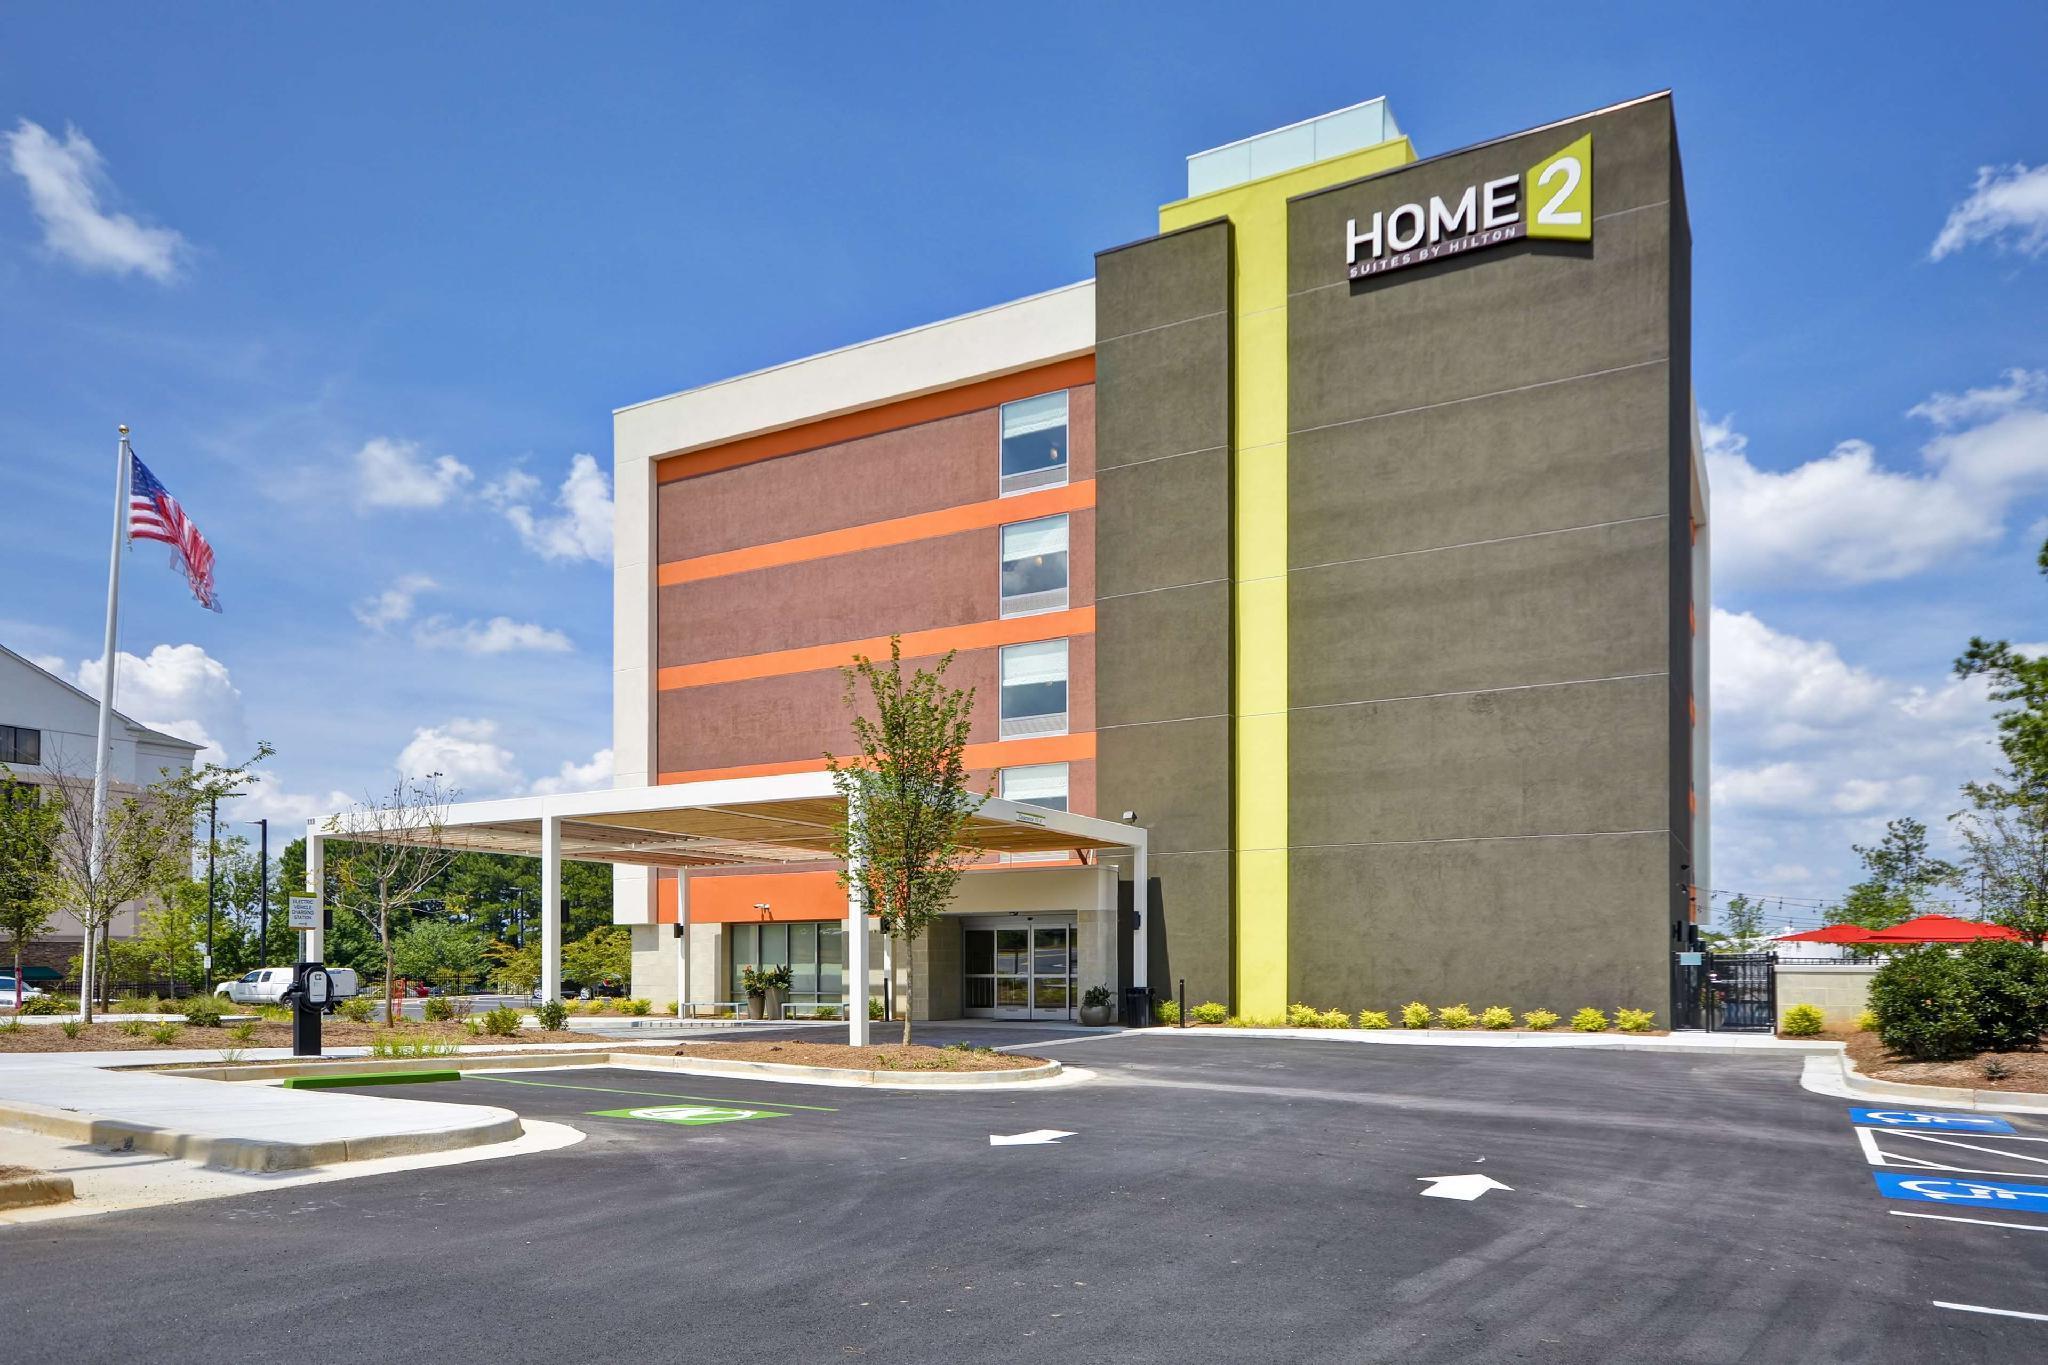 Home2 Suites By Hilton Atlanta West Lithia Springs